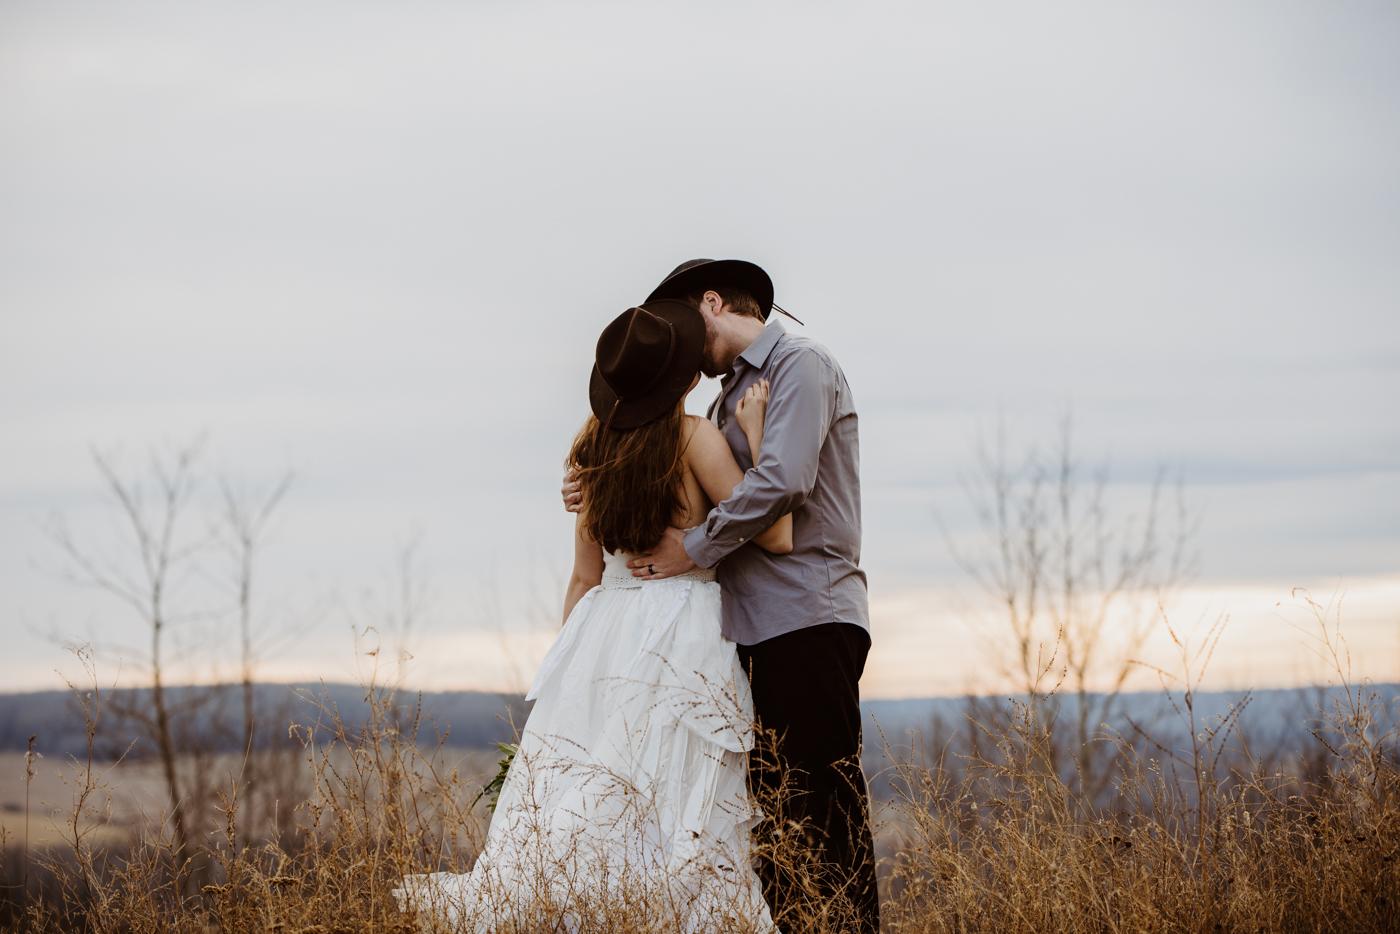 FortSt.John_photographer_TyraEPhotography_Wedding_Couple_Family_Photograhy_DawsonCreek_Elopement_Bride_Boduoir_Portraits-37.jpg